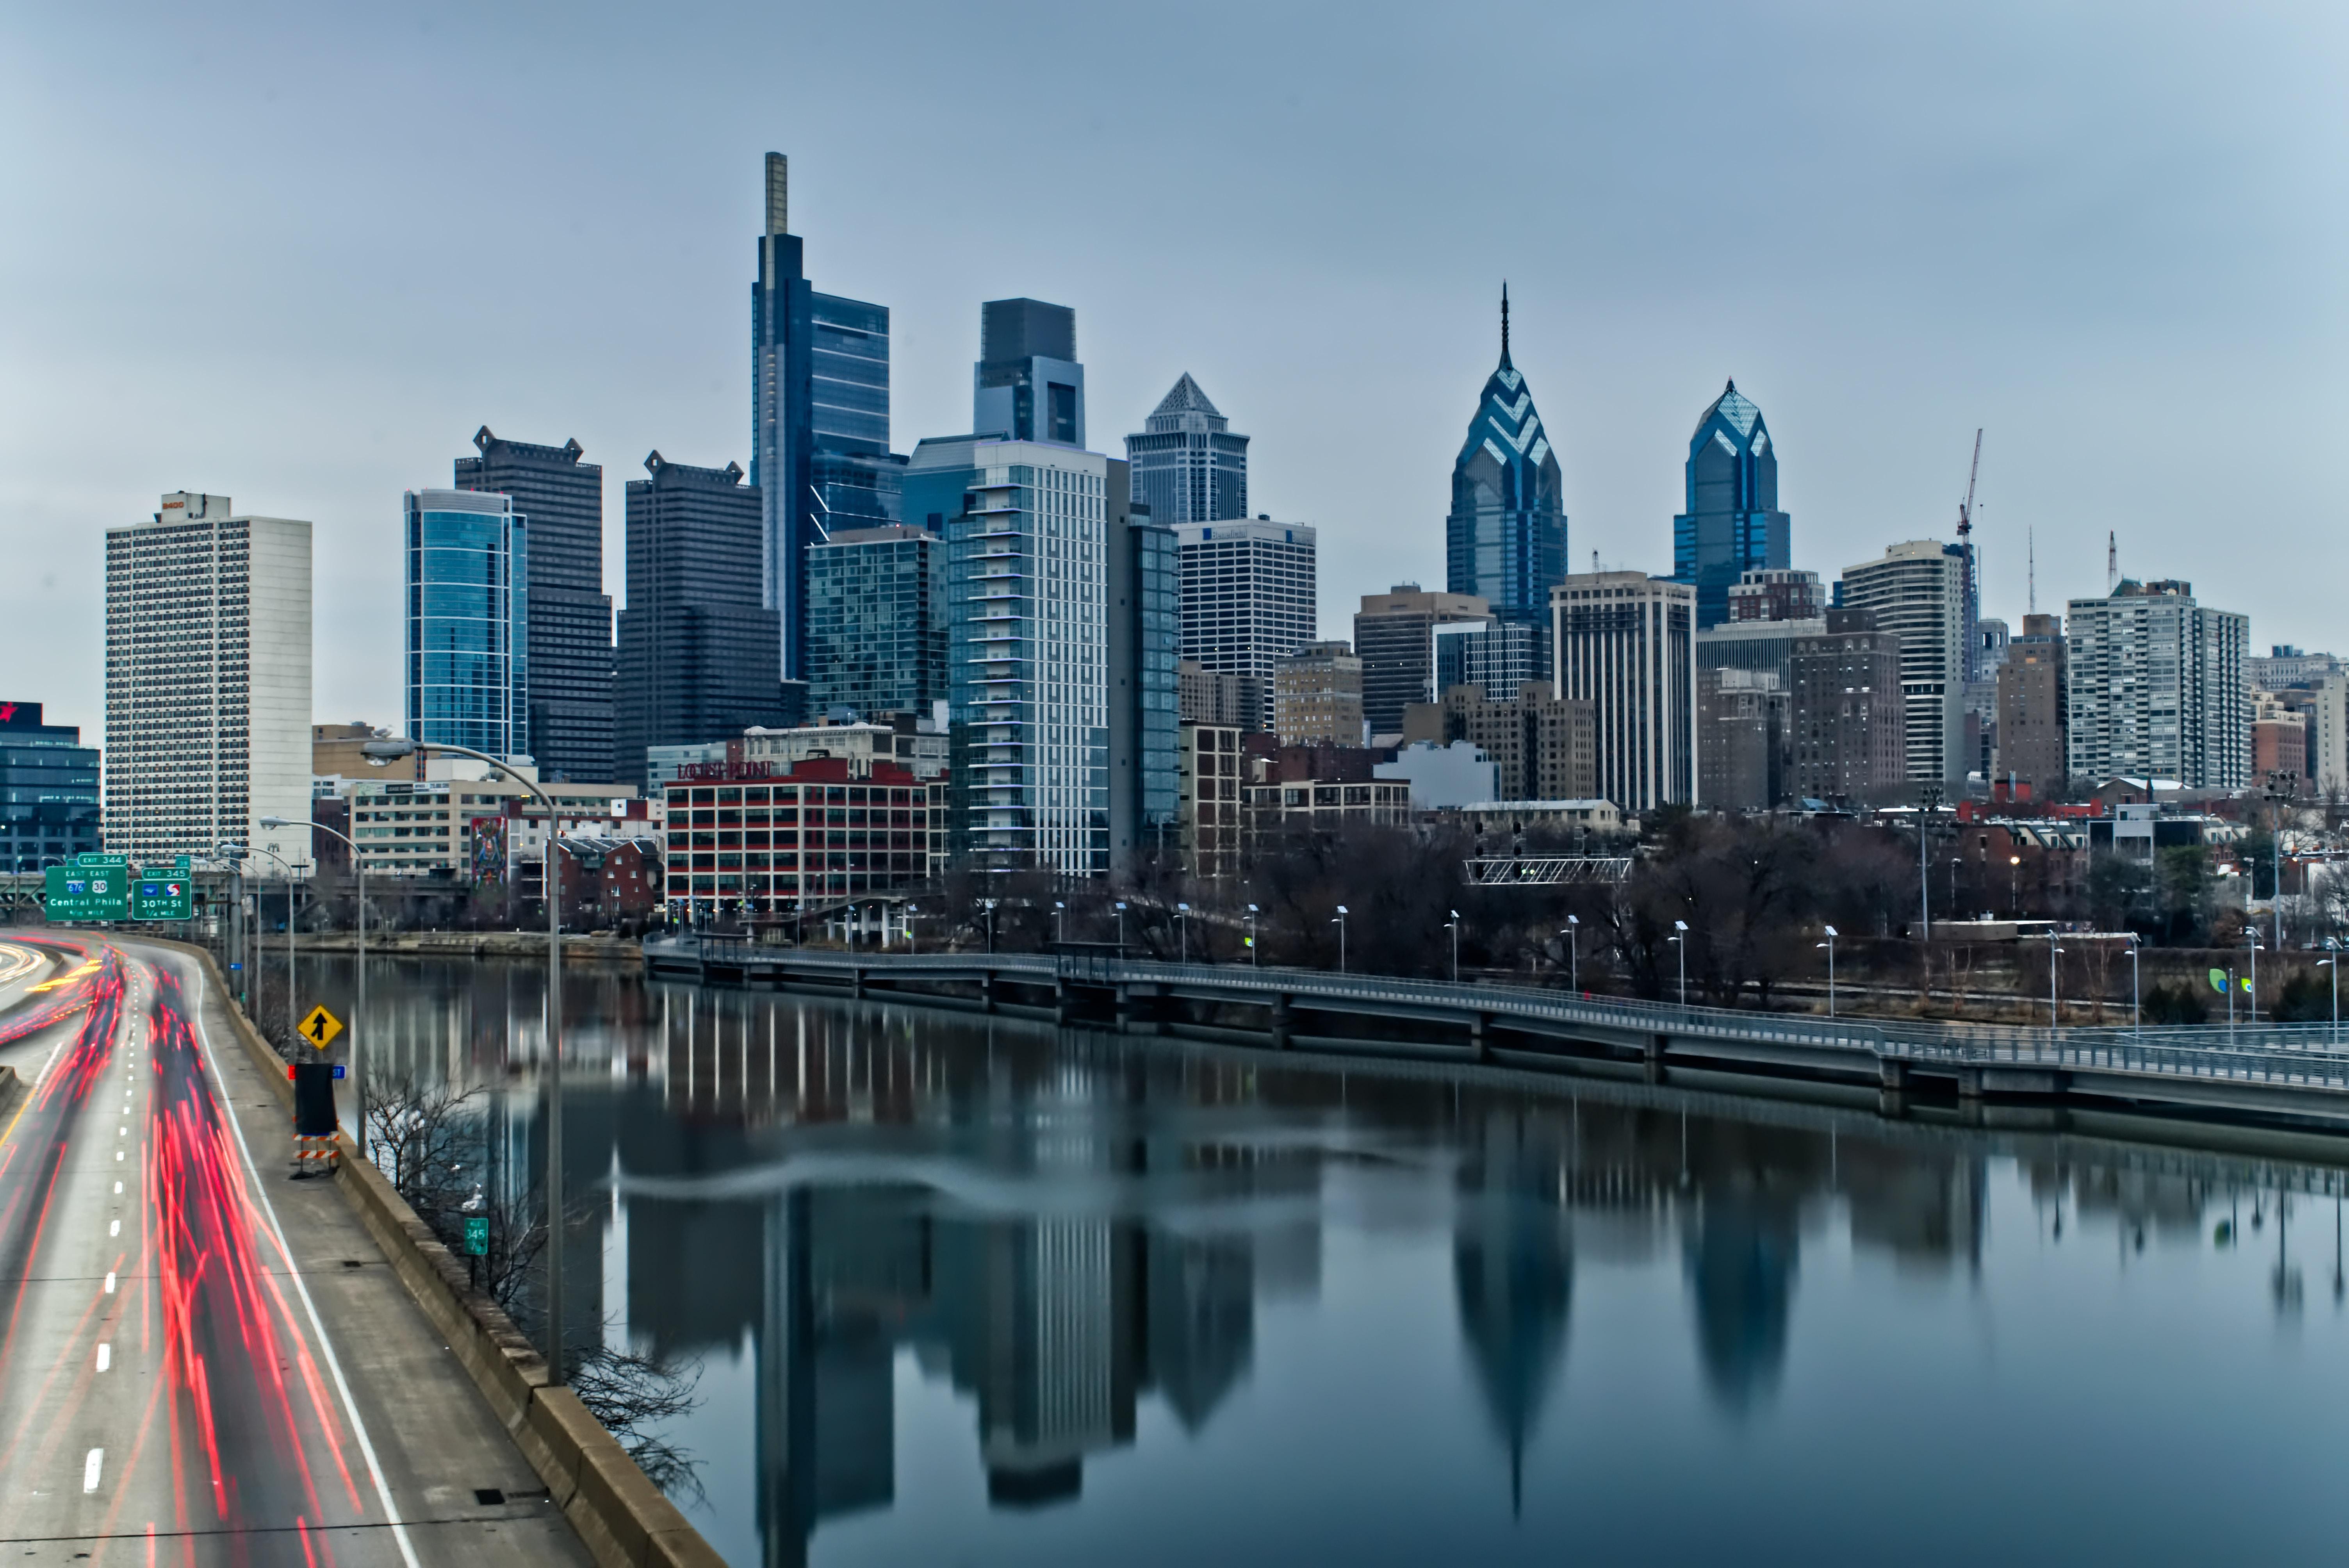 gibson hurst wEzyA3186eo unsplash - Asbestos Found in Philadelphia Schools